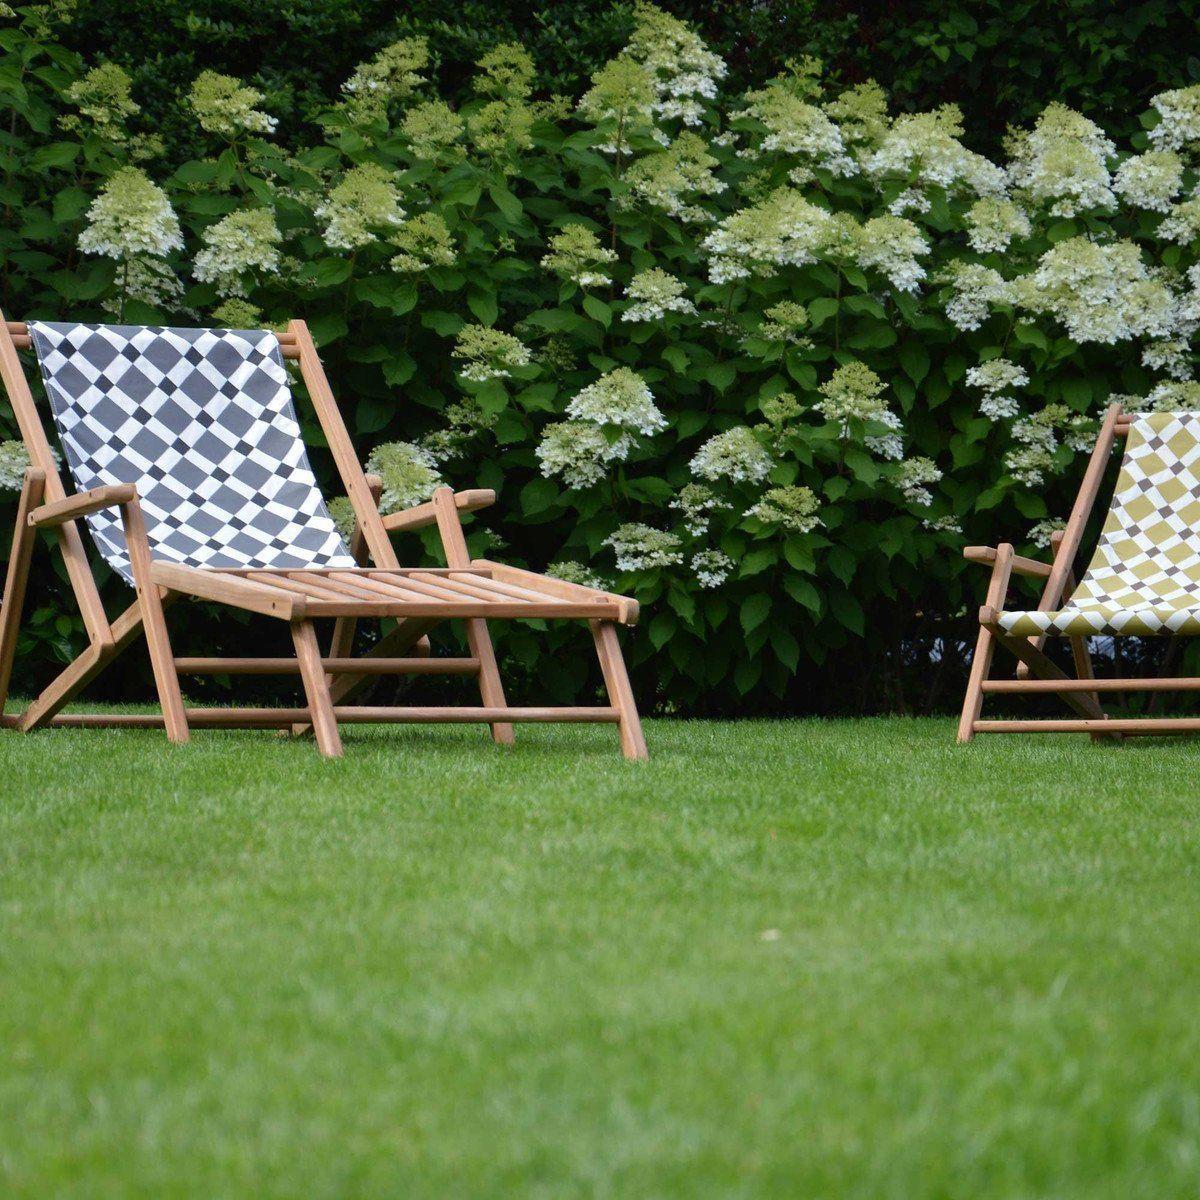 maxx deckchair liegestuhl jan kurtz. Black Bedroom Furniture Sets. Home Design Ideas